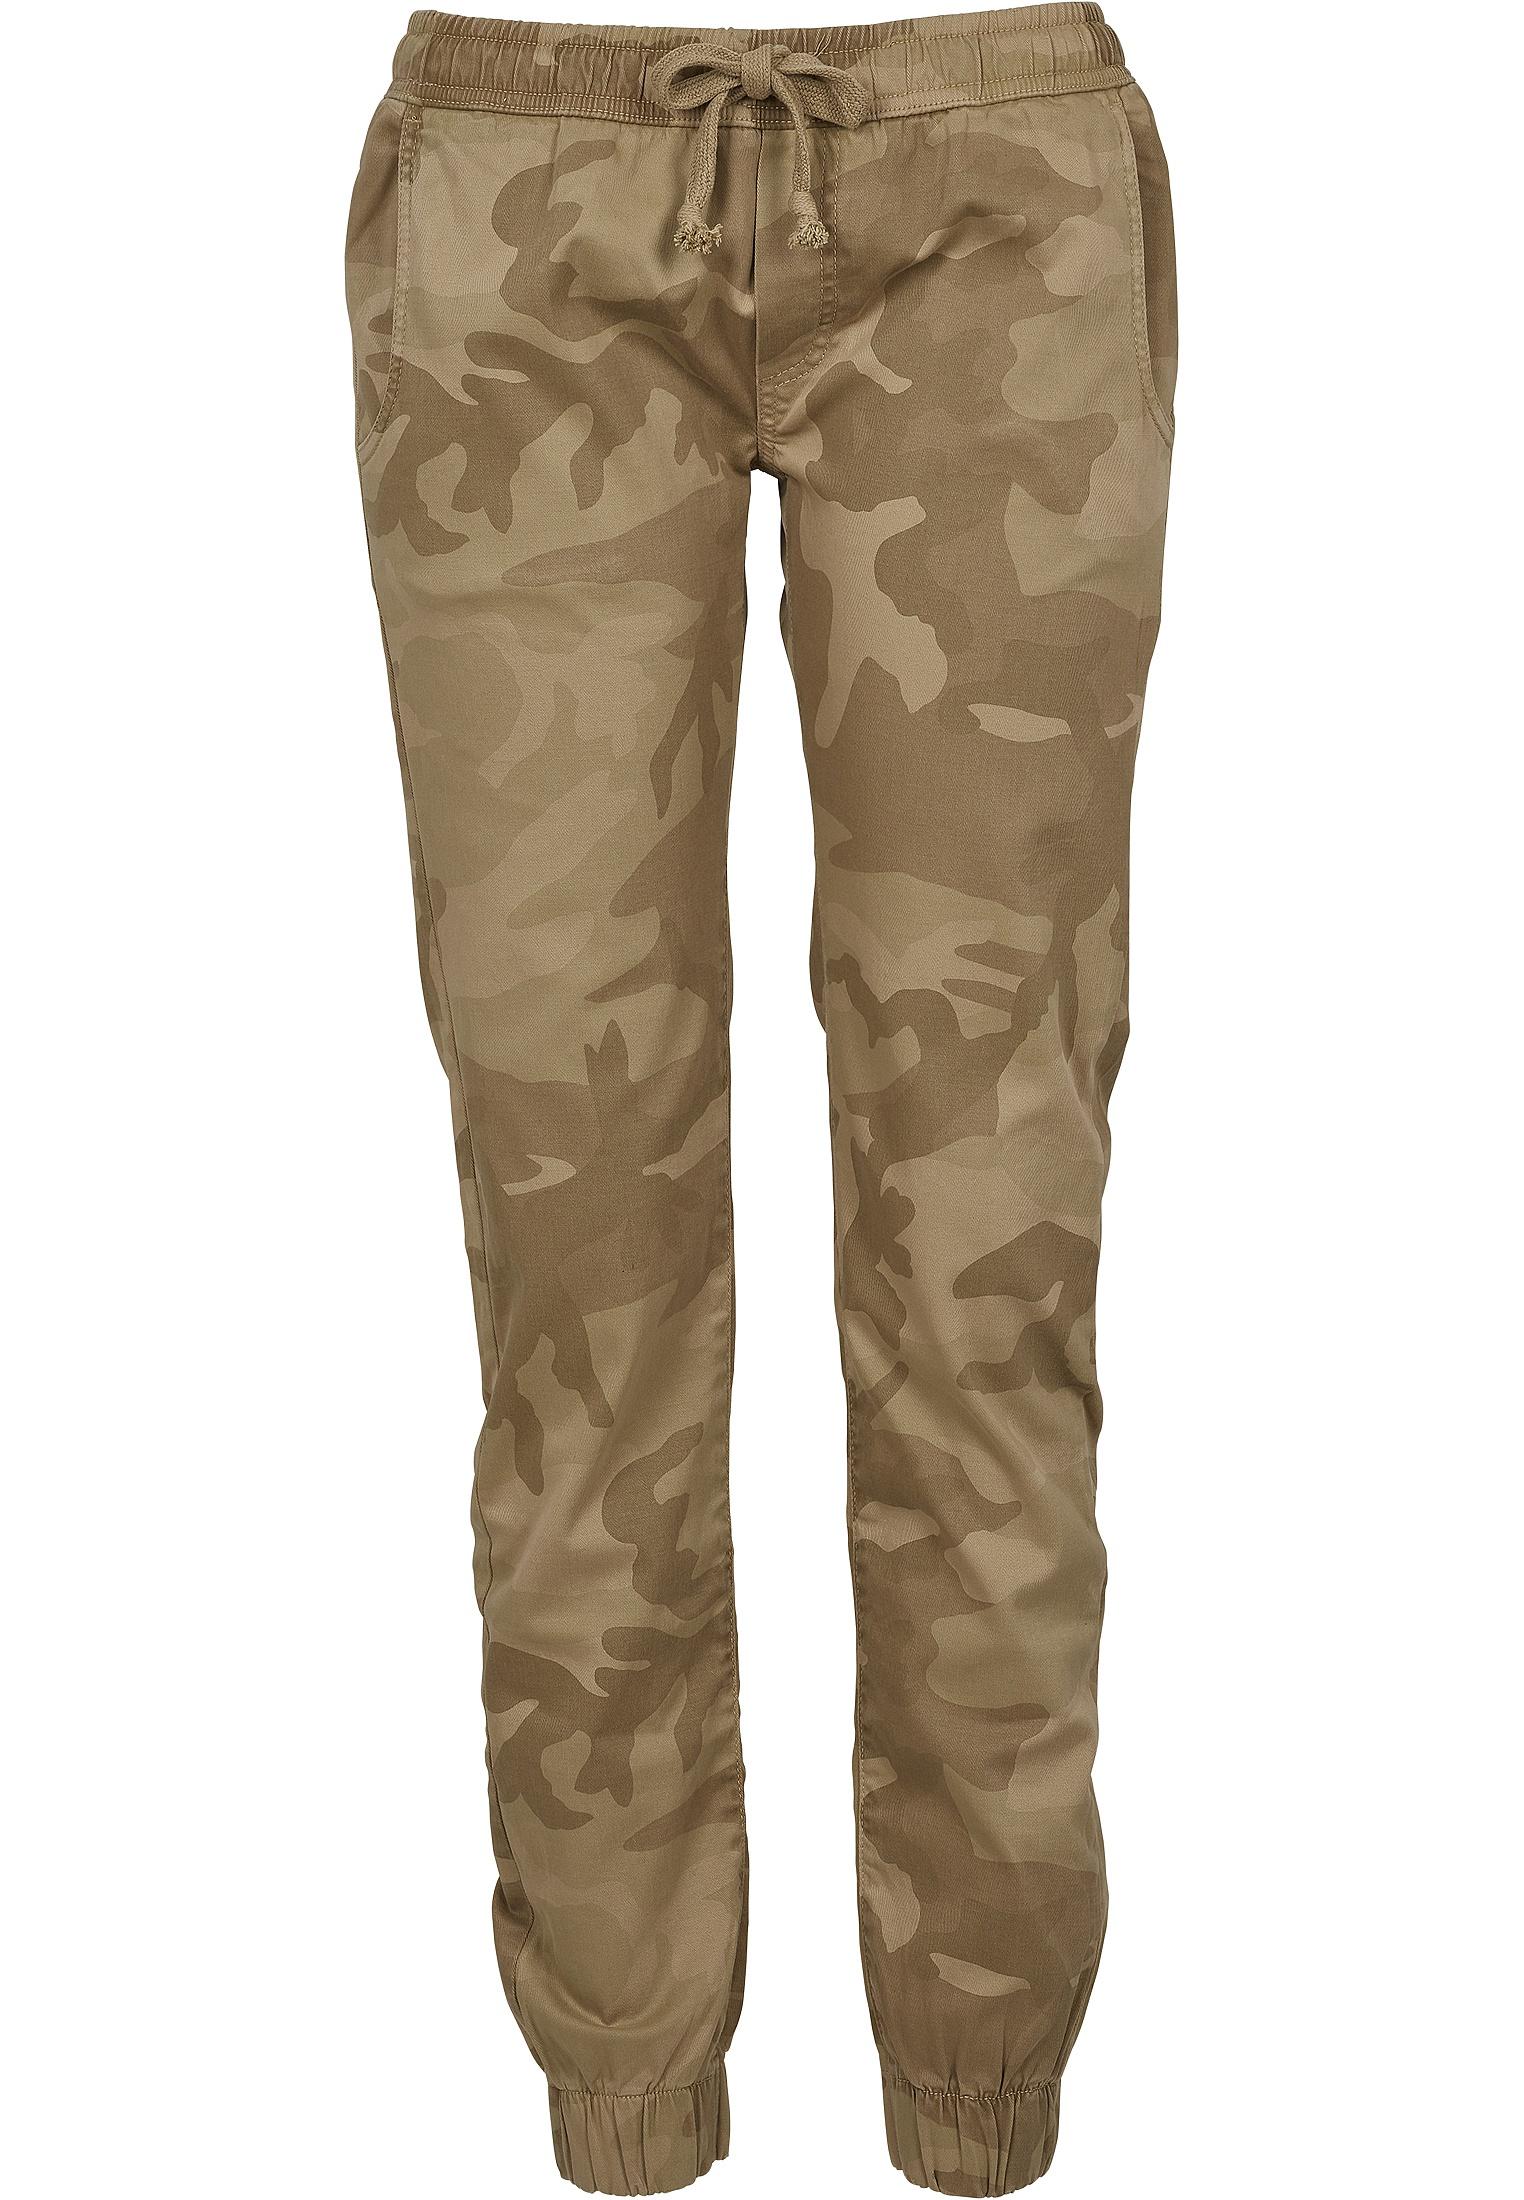 spodnie Urban Classics Camo Jogging/TB1998 - Sand Camouflage